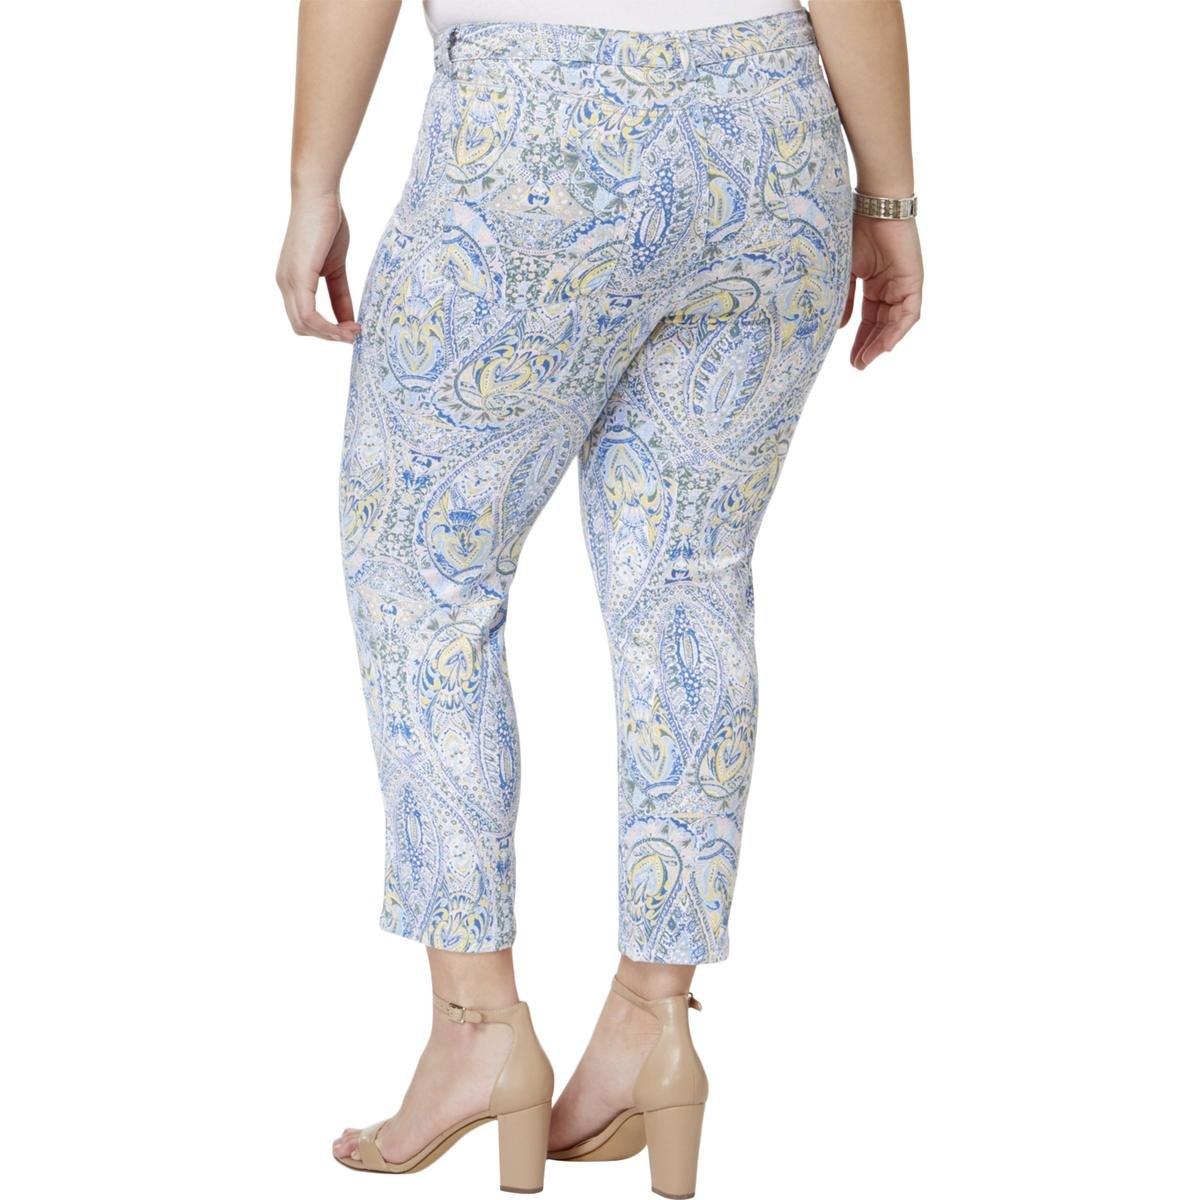 d674109a568 Charter Club Womens Plus Bristol Denim Printed Capri Jeans Blue 24W at  Amazon Women s Clothing store